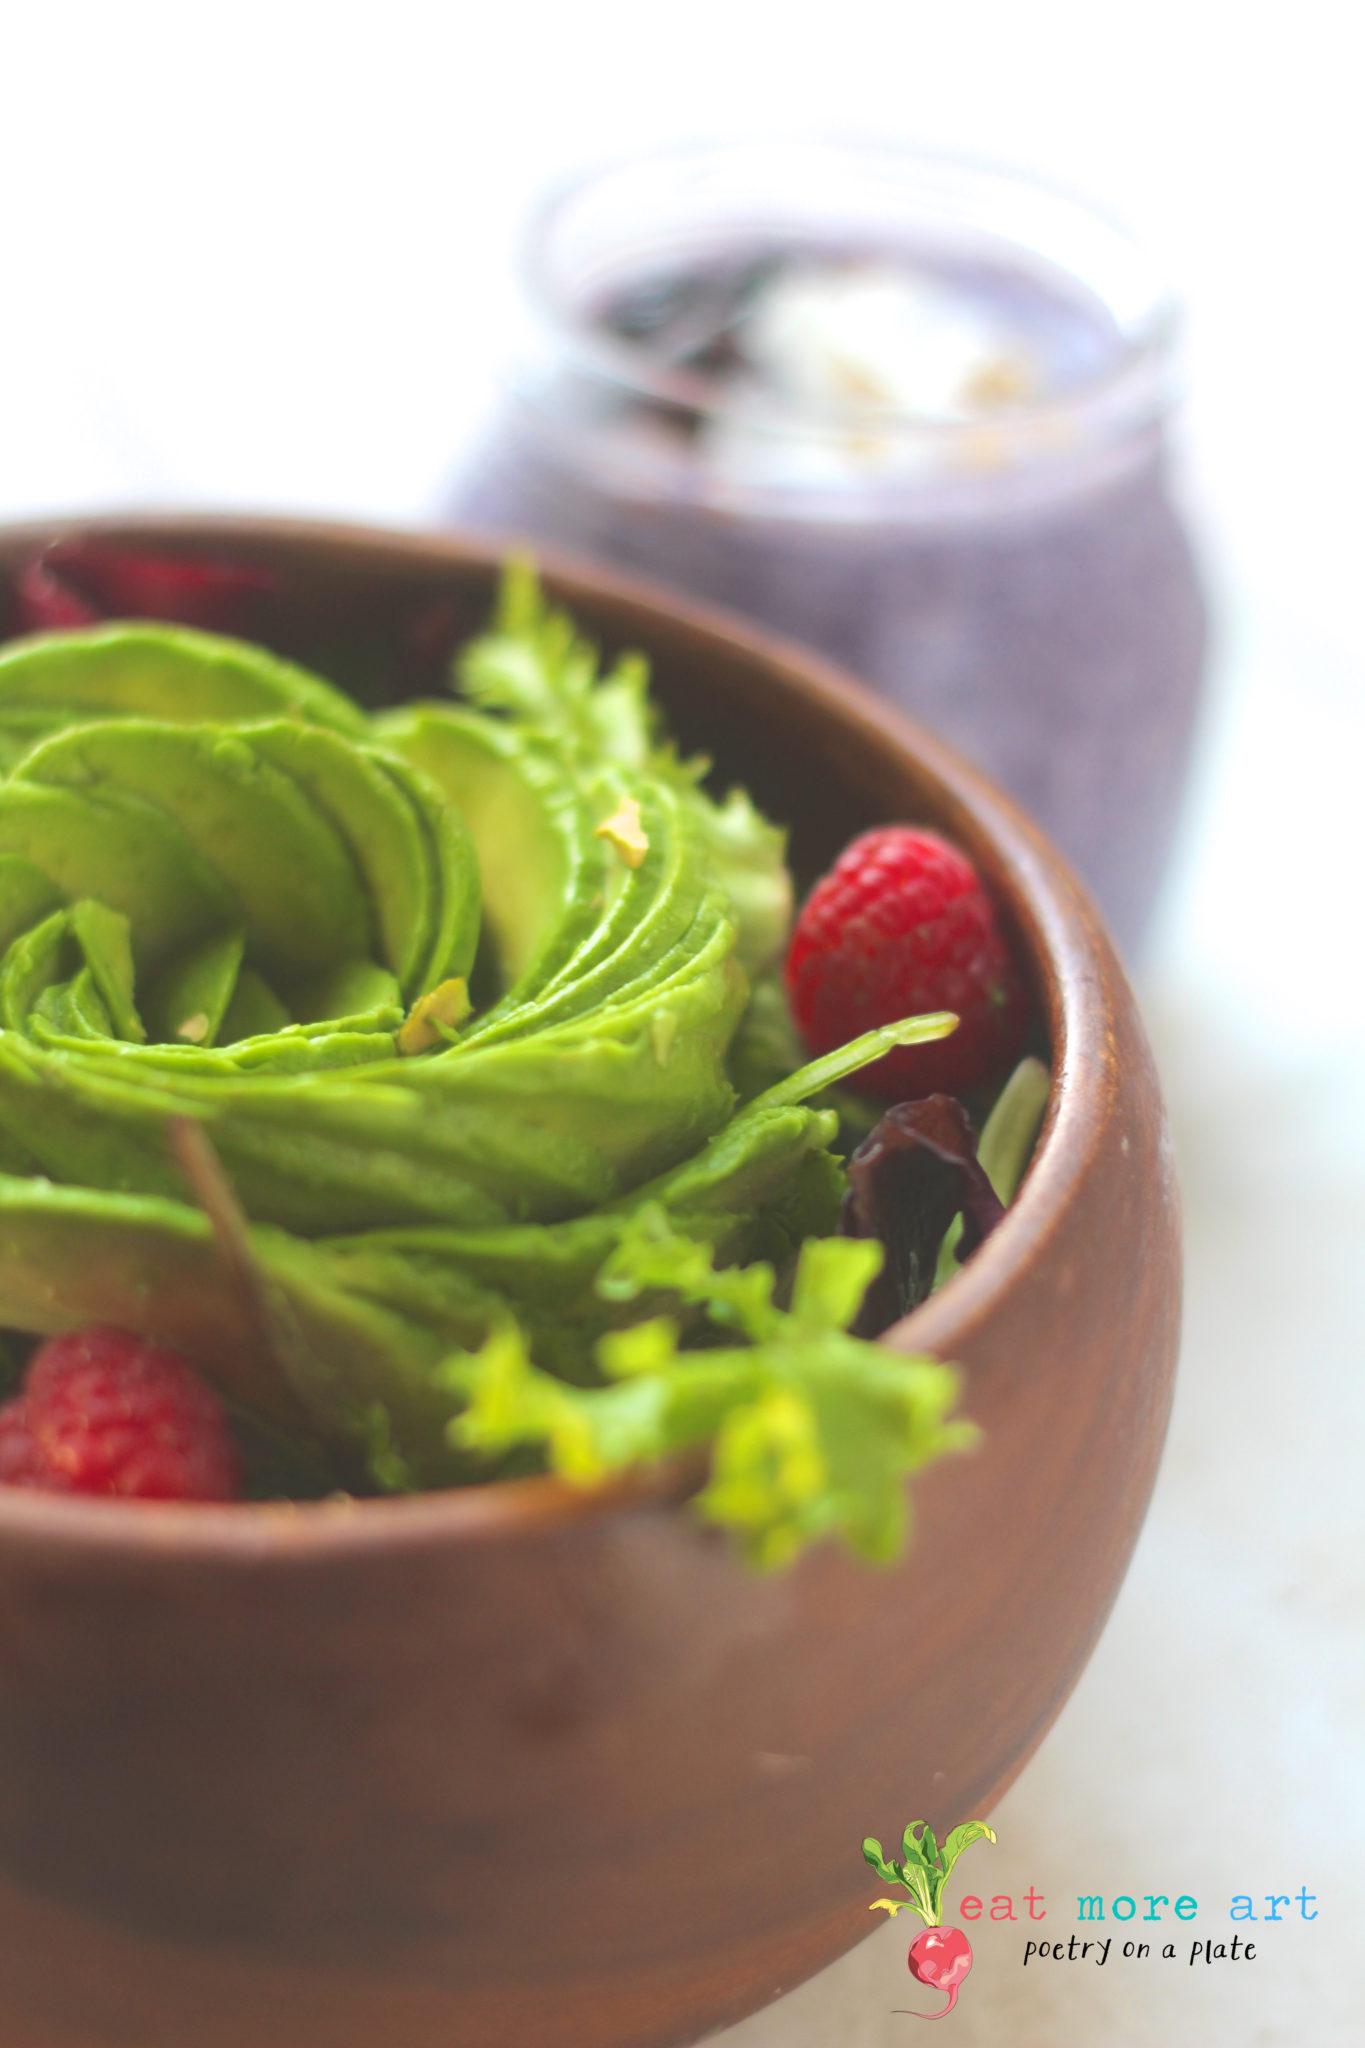 ''Tis the Season' Salad | Avocado, Greens & Raspberries